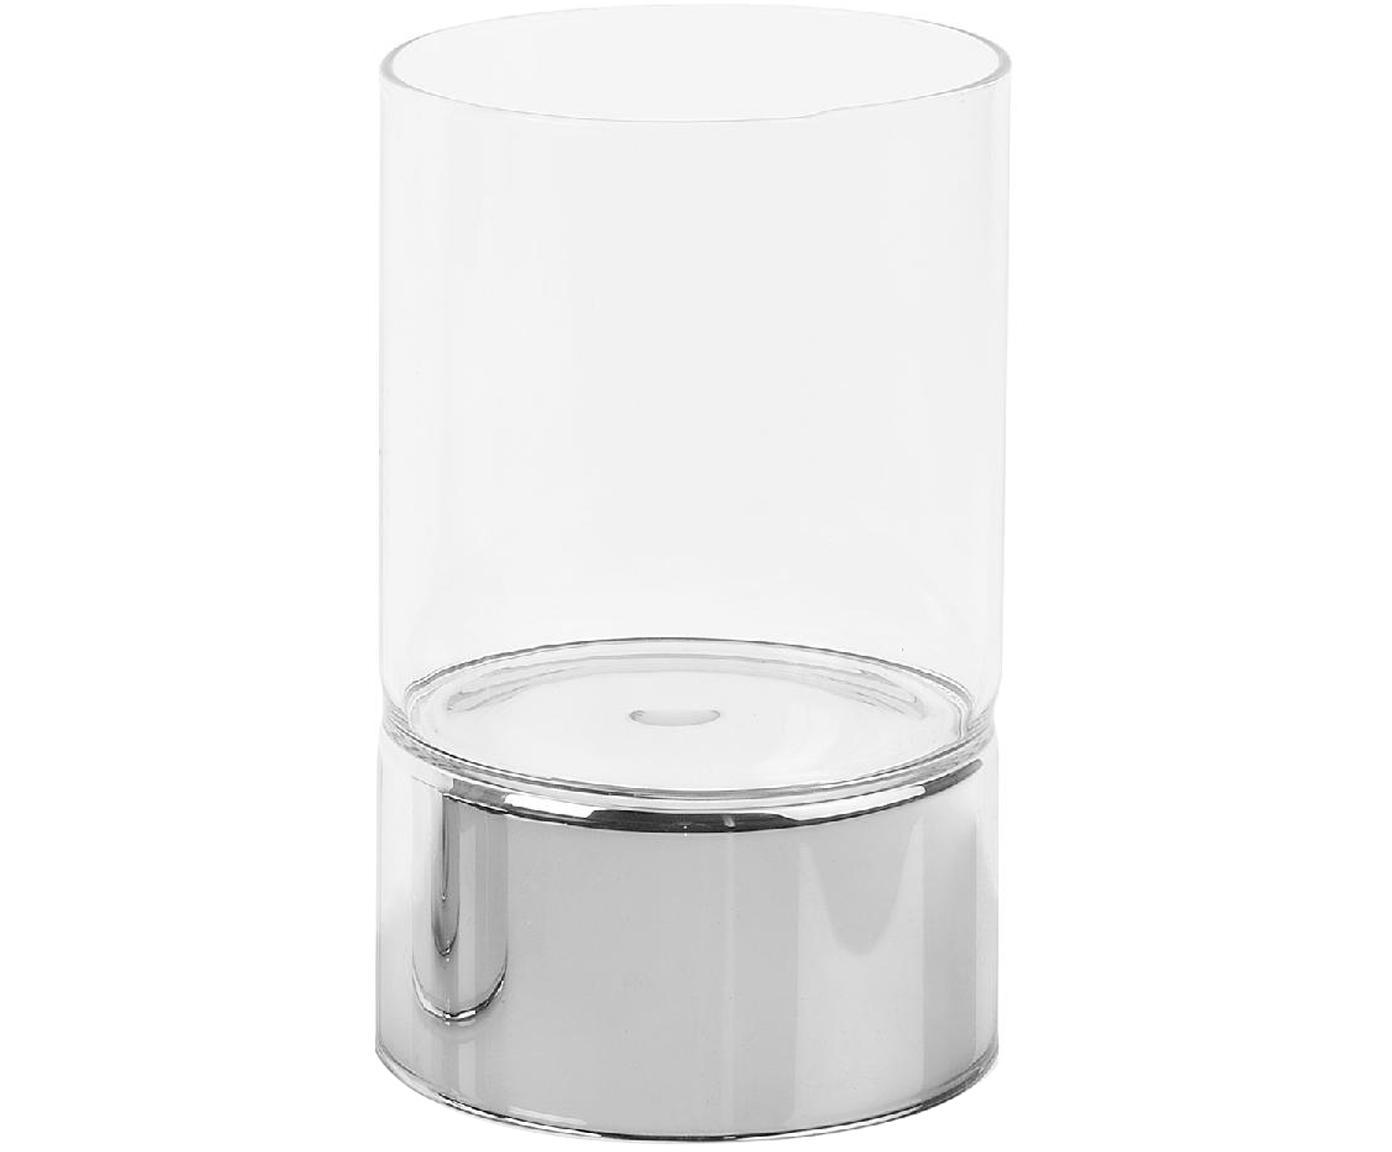 Windlicht Bartholomeu, Glas, Chrom, Transparent, Ø 9 x H 15 cm